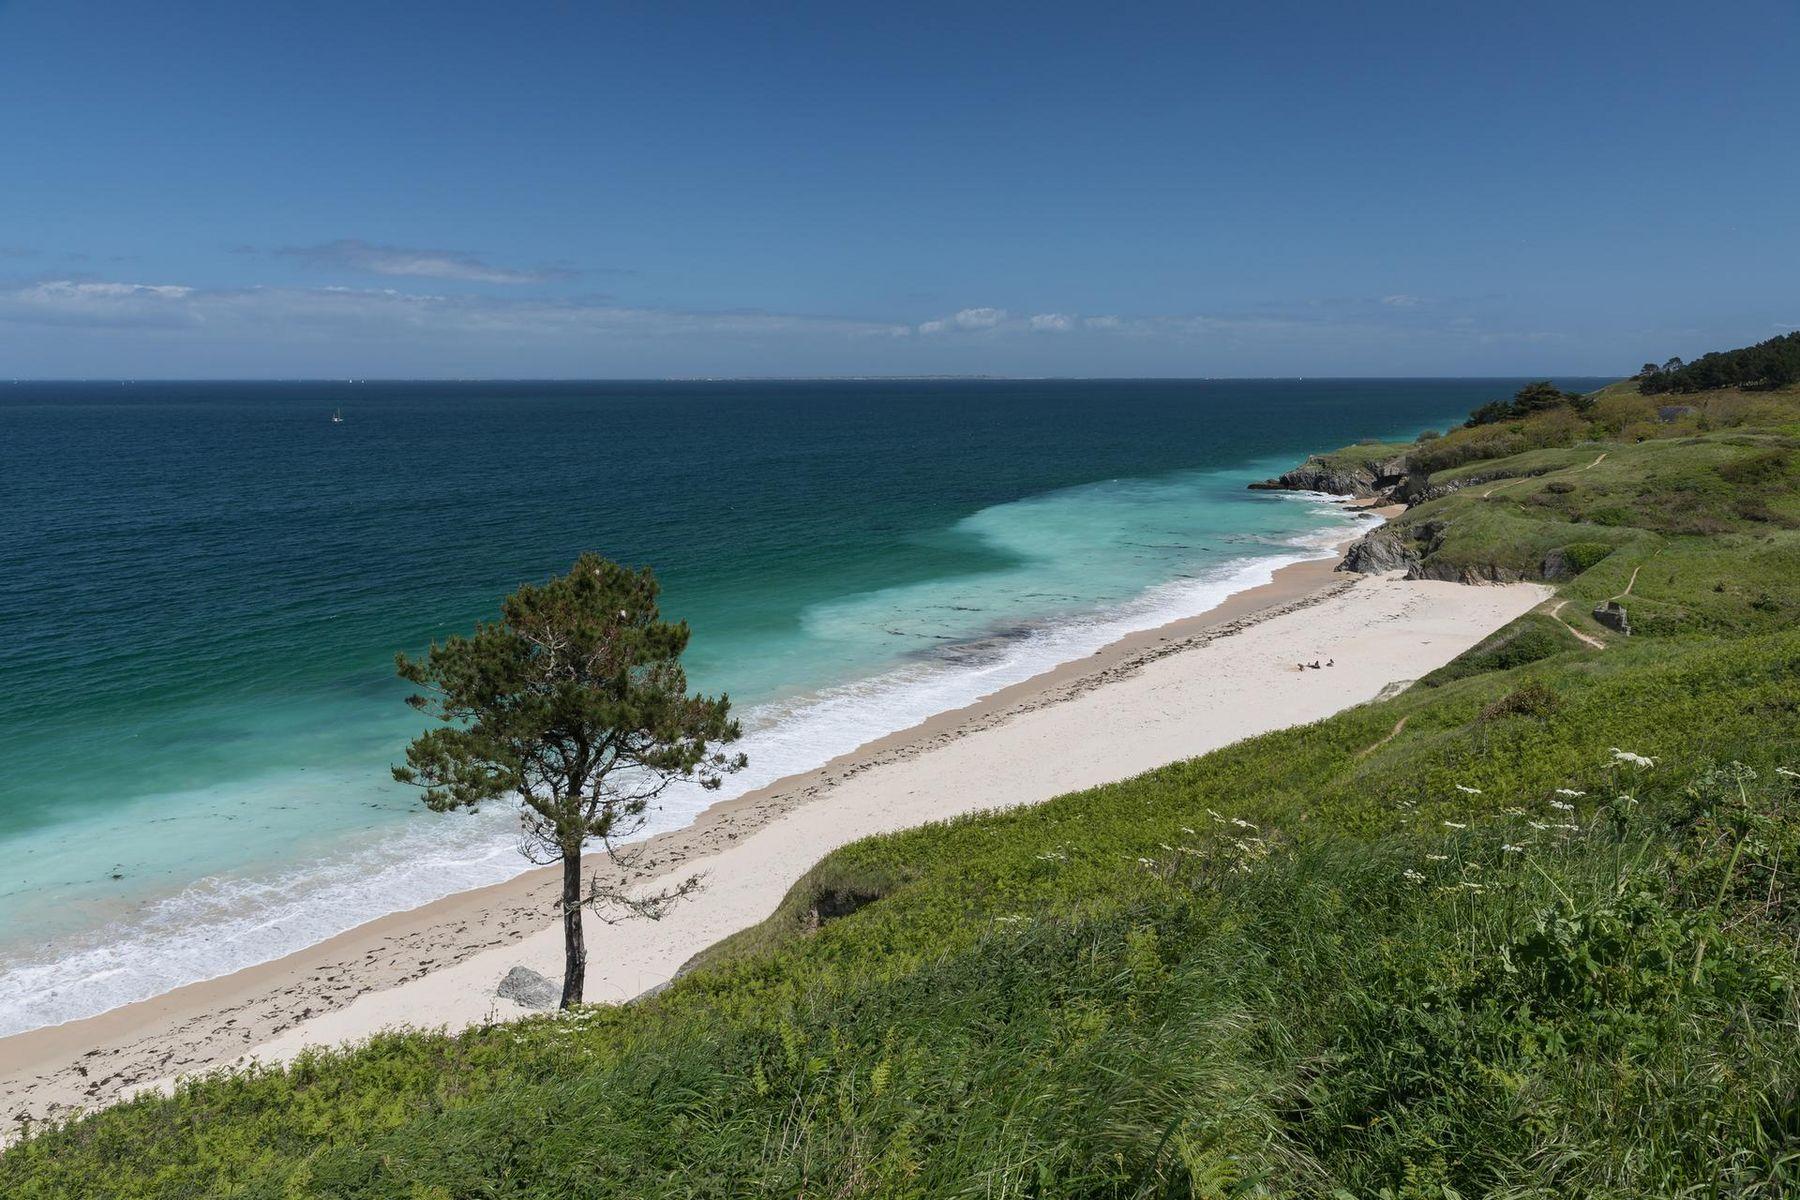 Belle Ile de Mer iStock 959384136